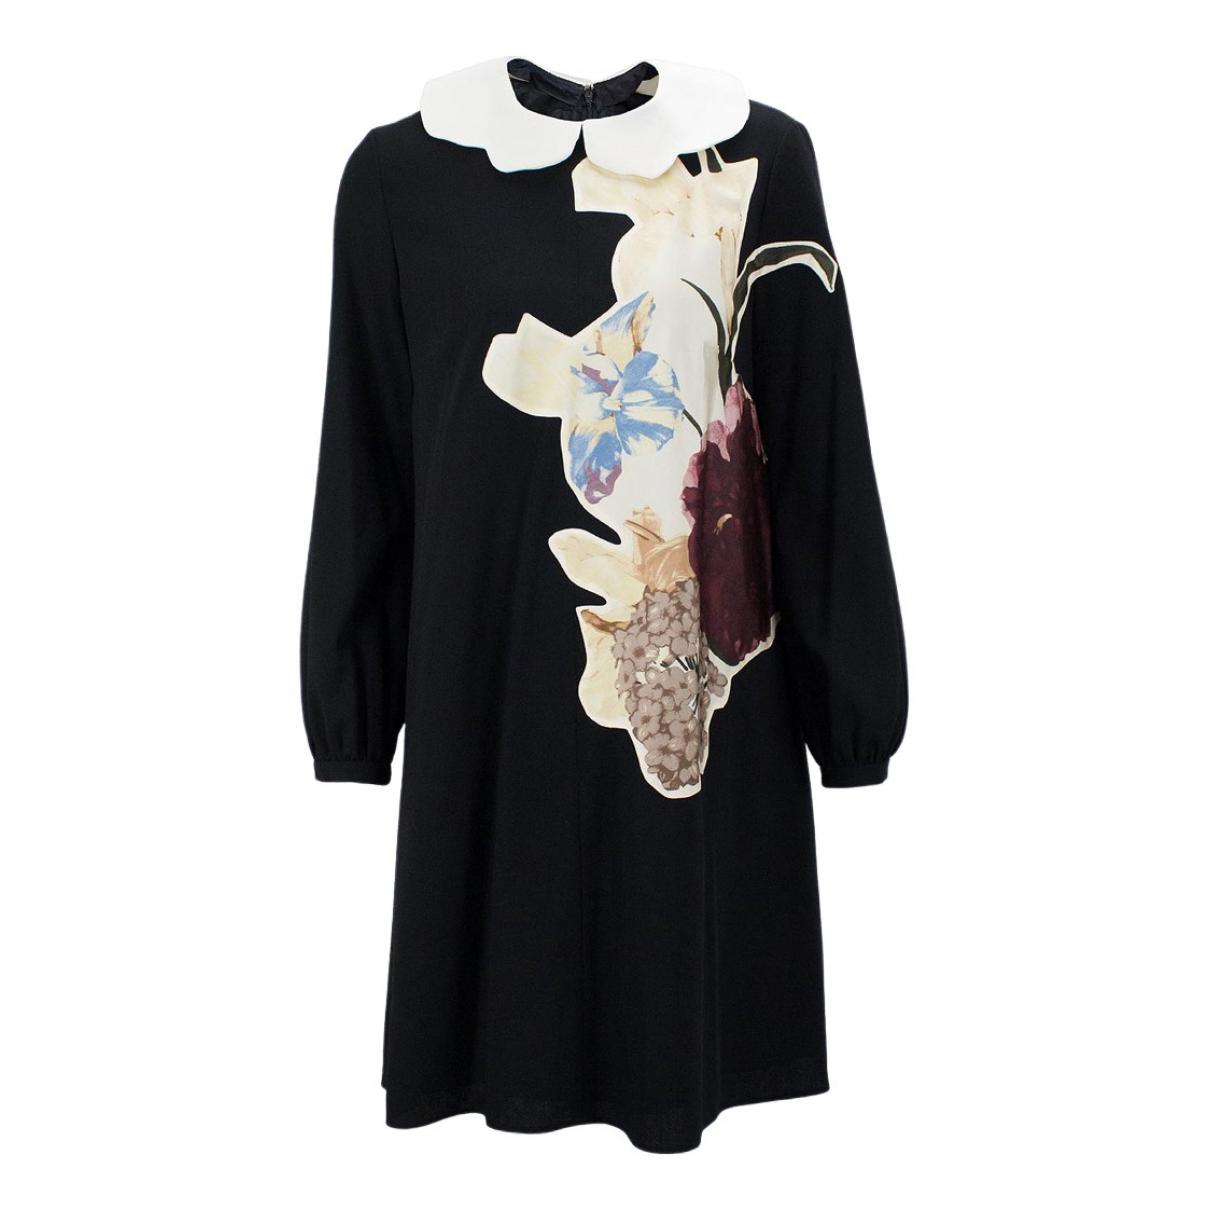 Valentino Garavani - Robe   pour femme en laine - multicolore